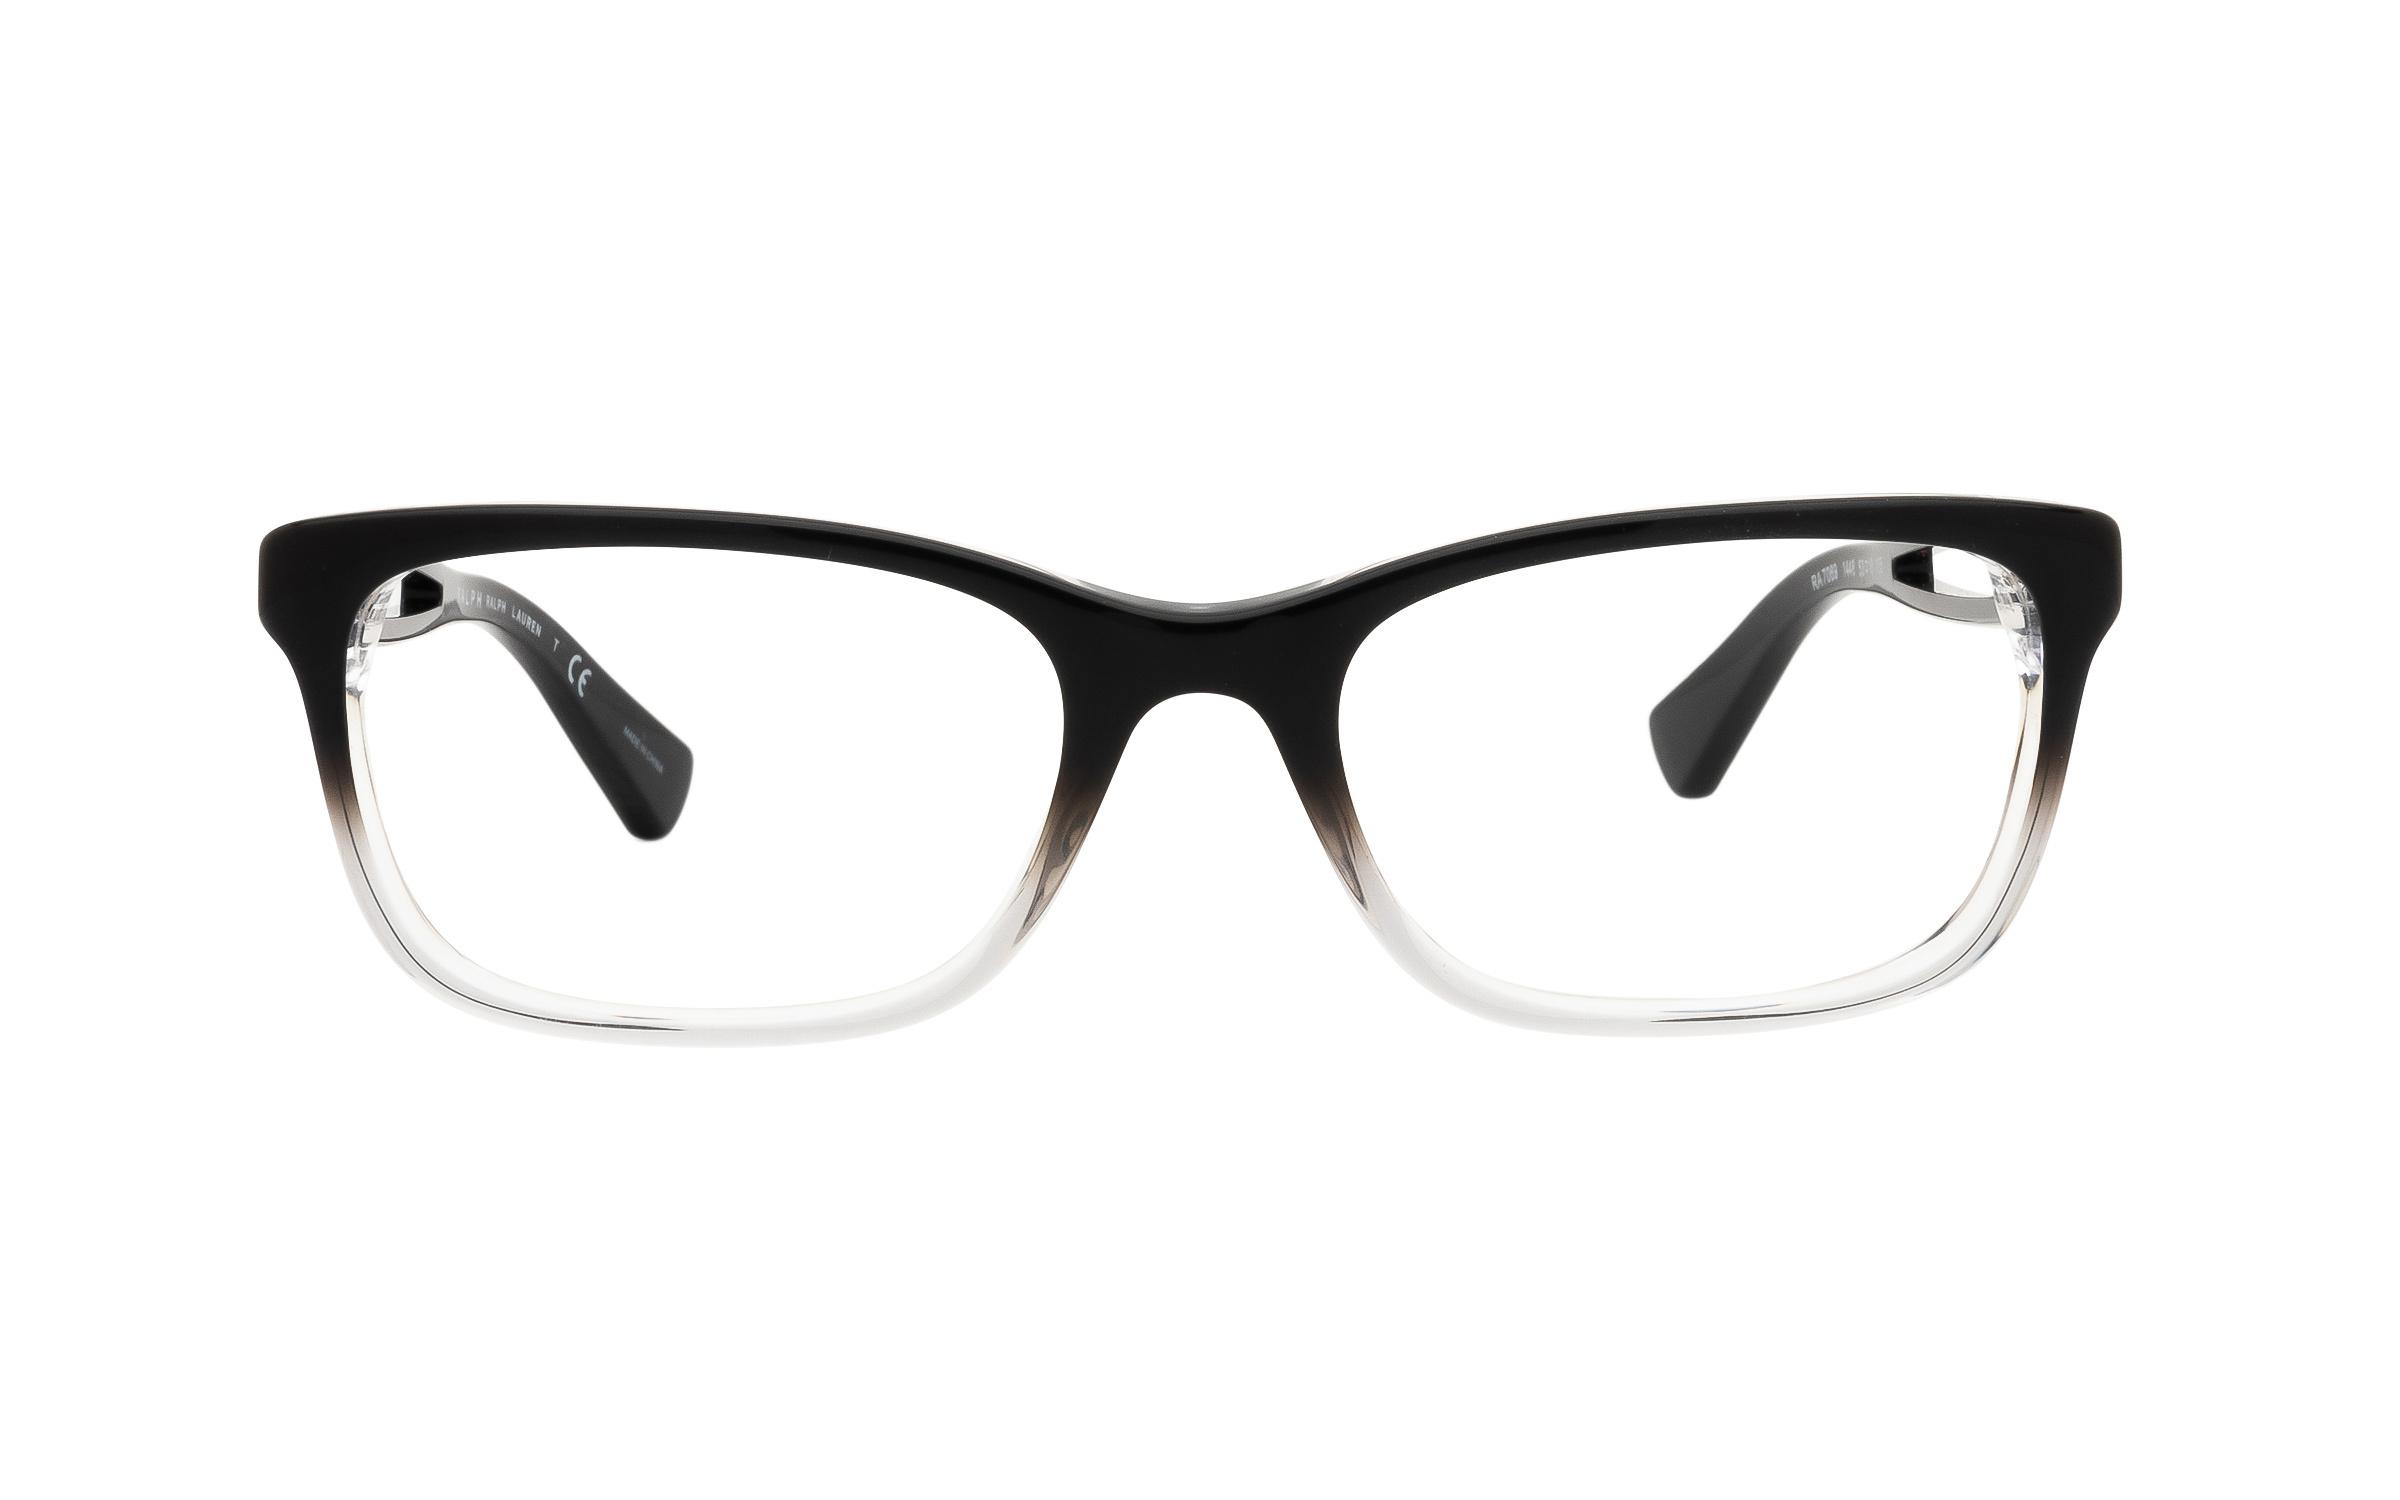 Ralph by Ralph Lauren RA7069 1448 (53) Eyeglasses and Frame in Gradient Black - Online Coastal